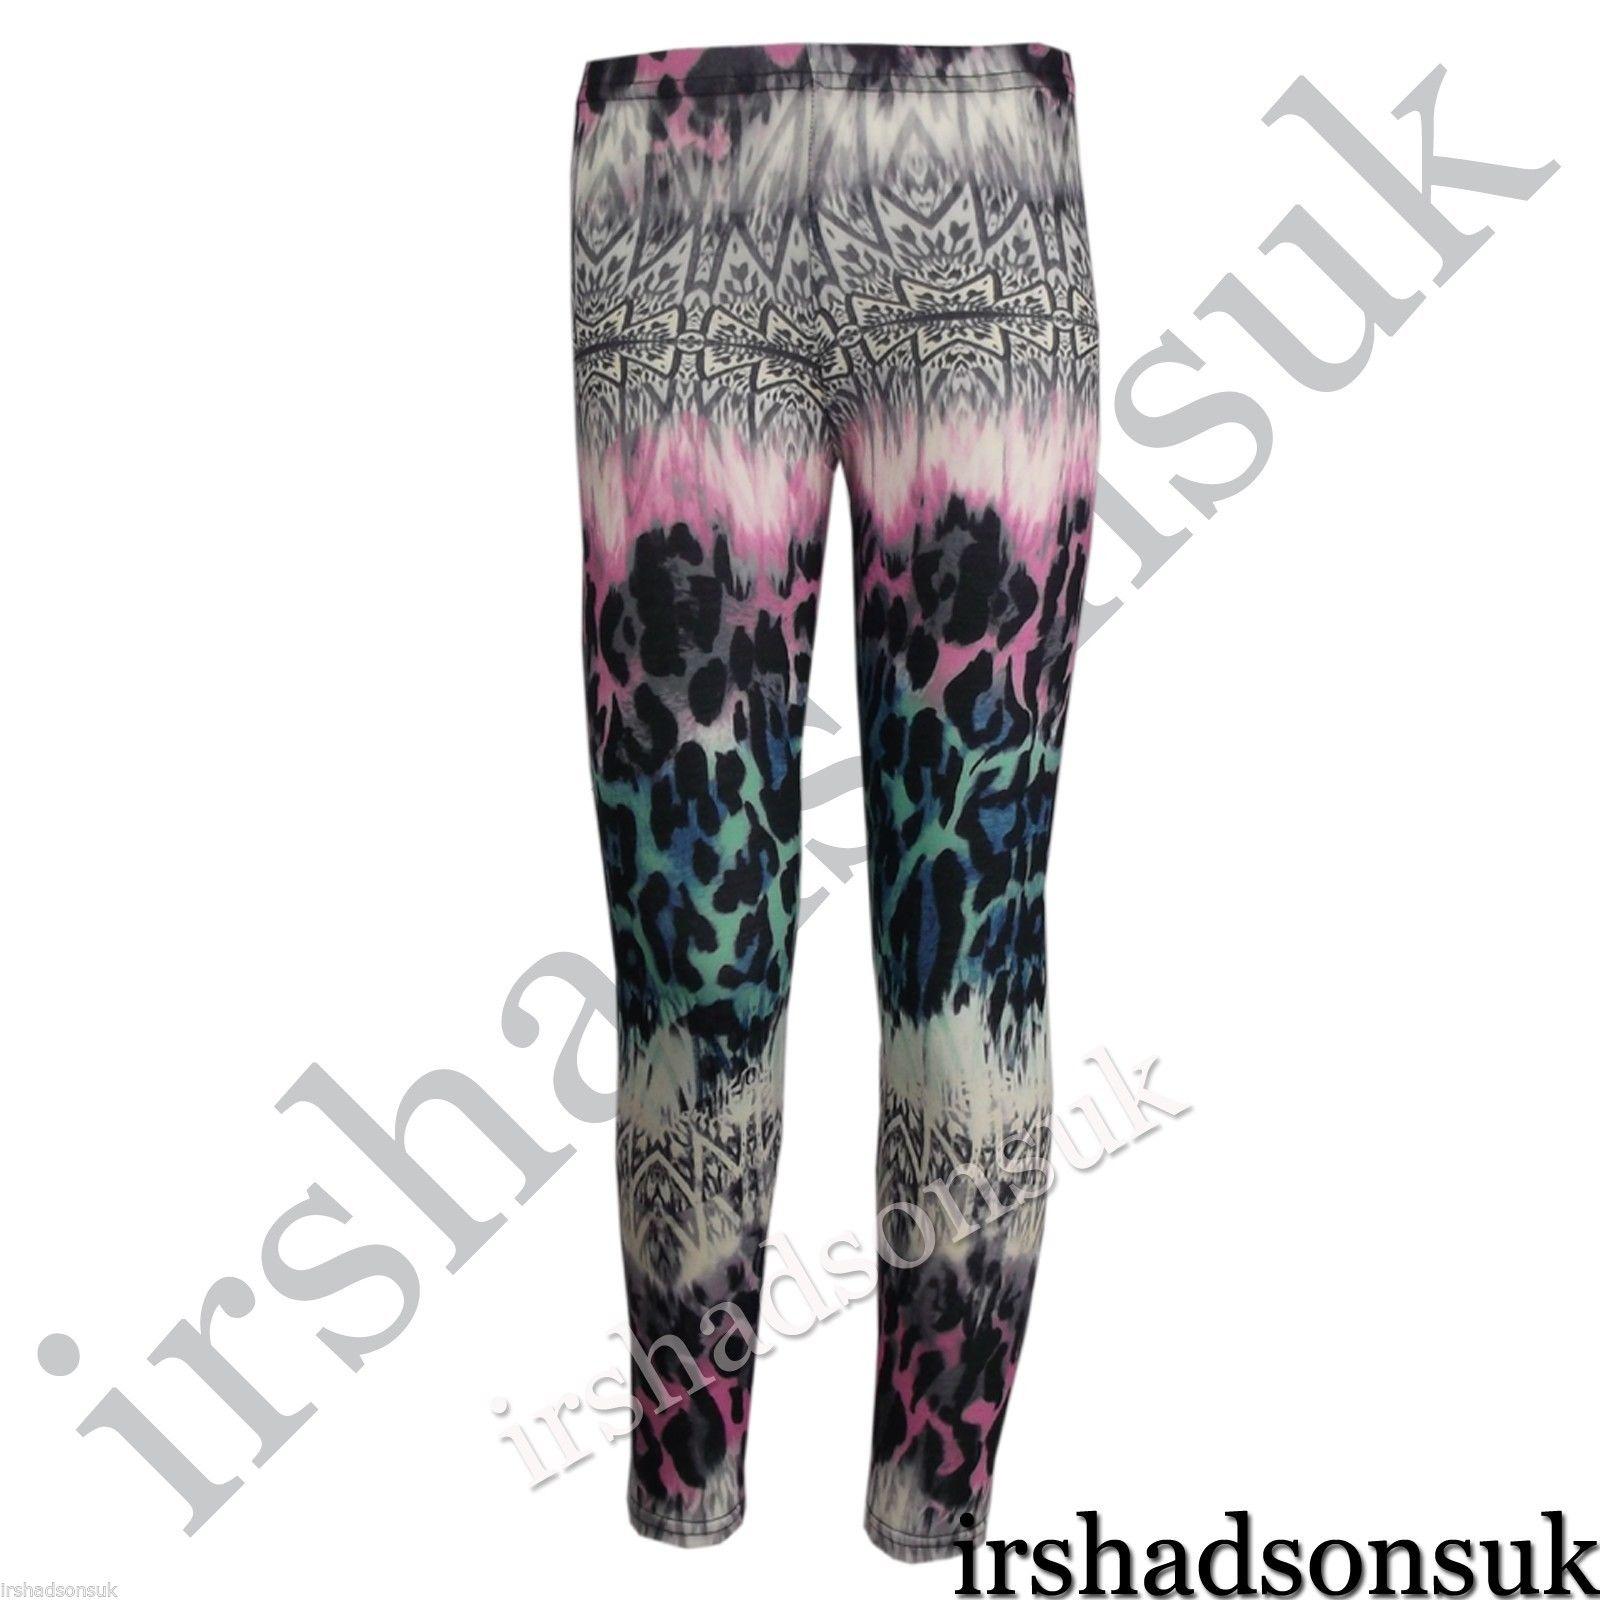 Ninas-Chicas-NEW-Temporada-Estampado-Leopardo-Legings-Midi-Vestido-Skater-falda